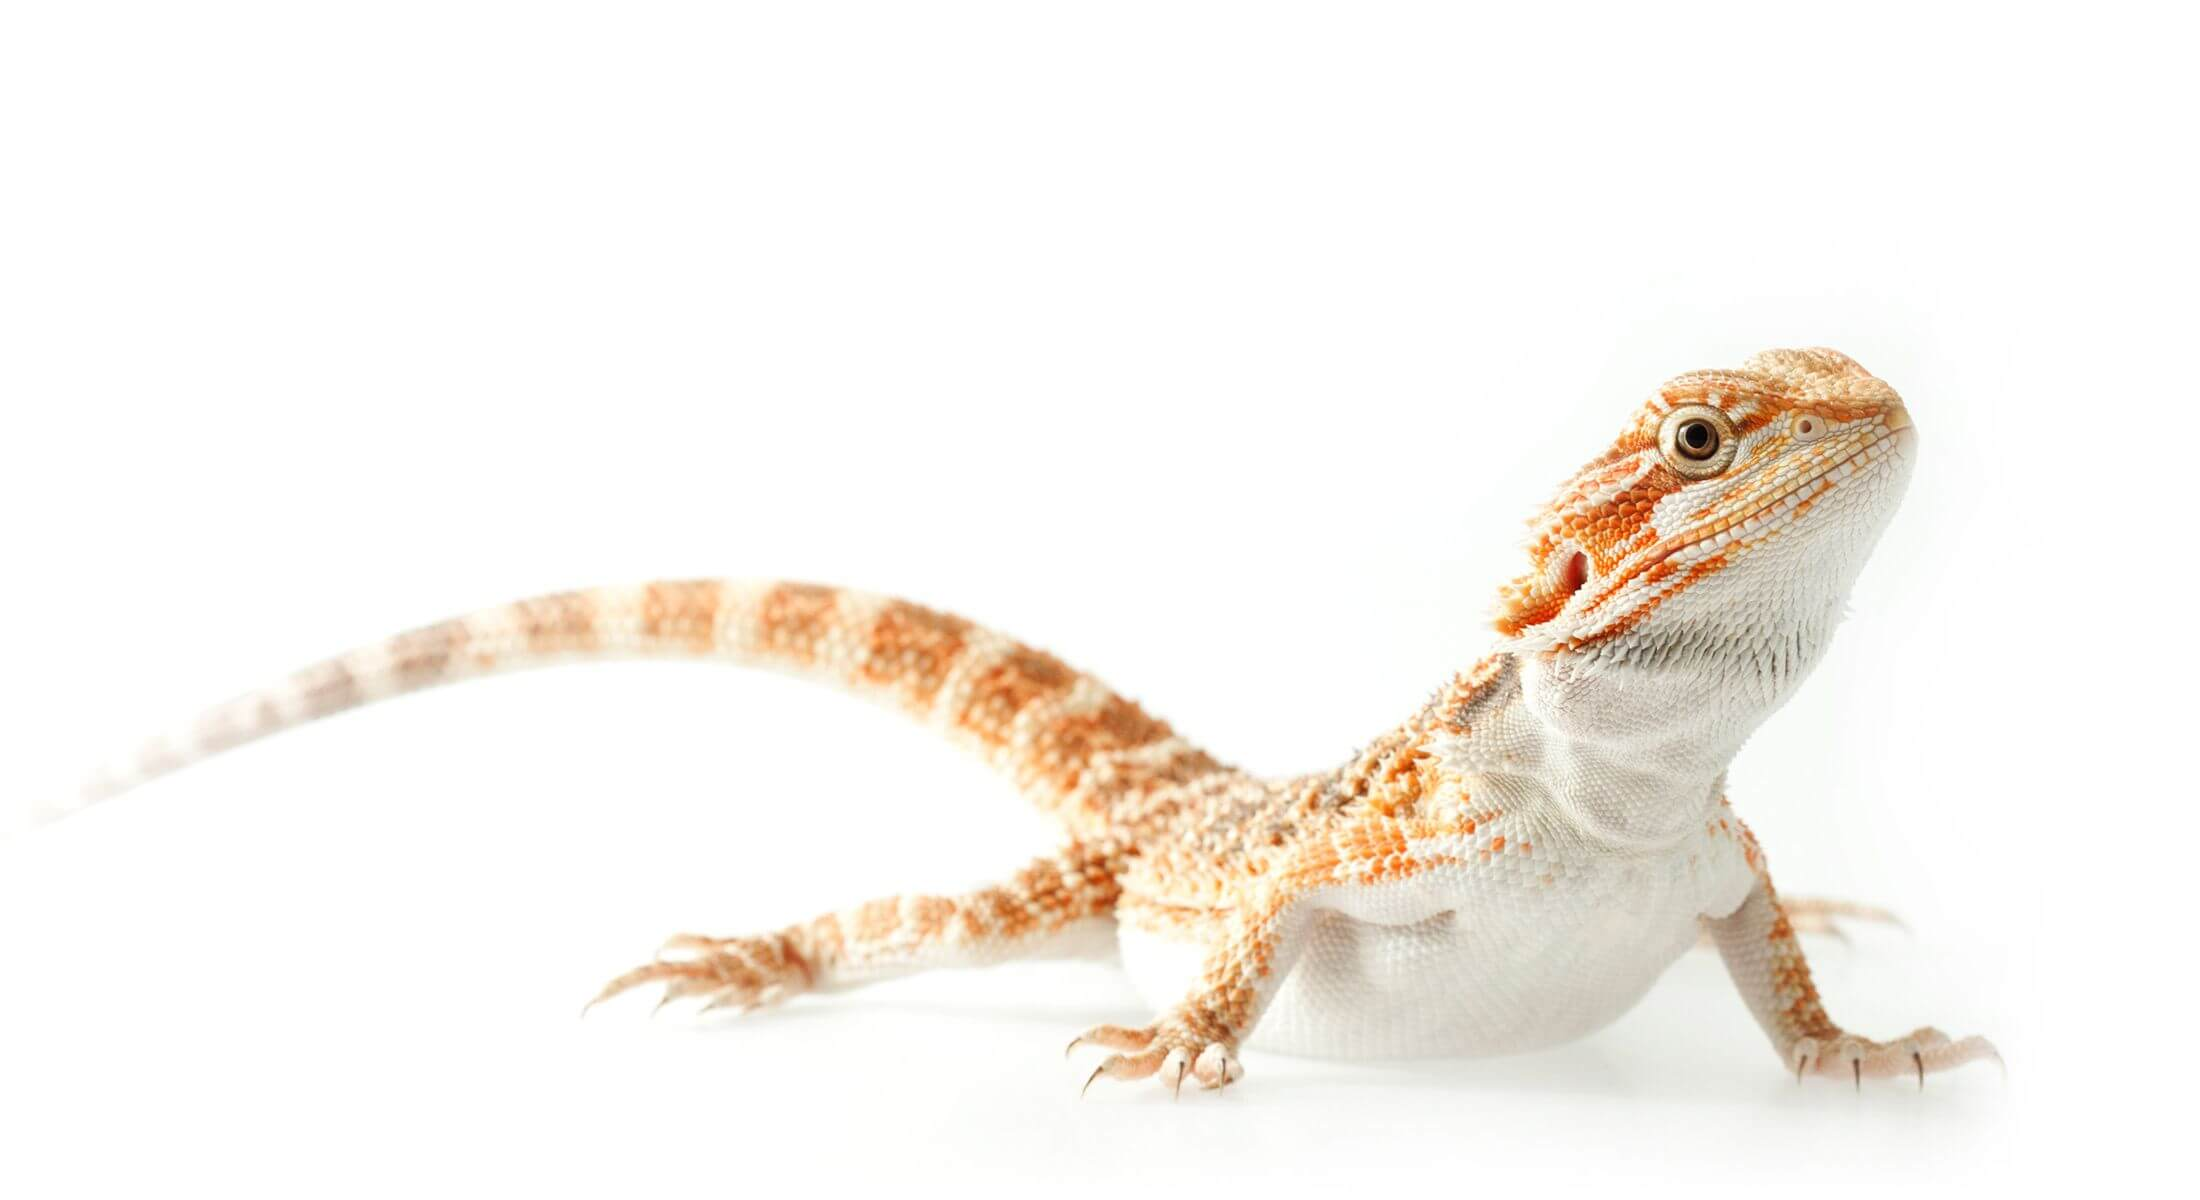 Bearded dragon, an Australian lizard